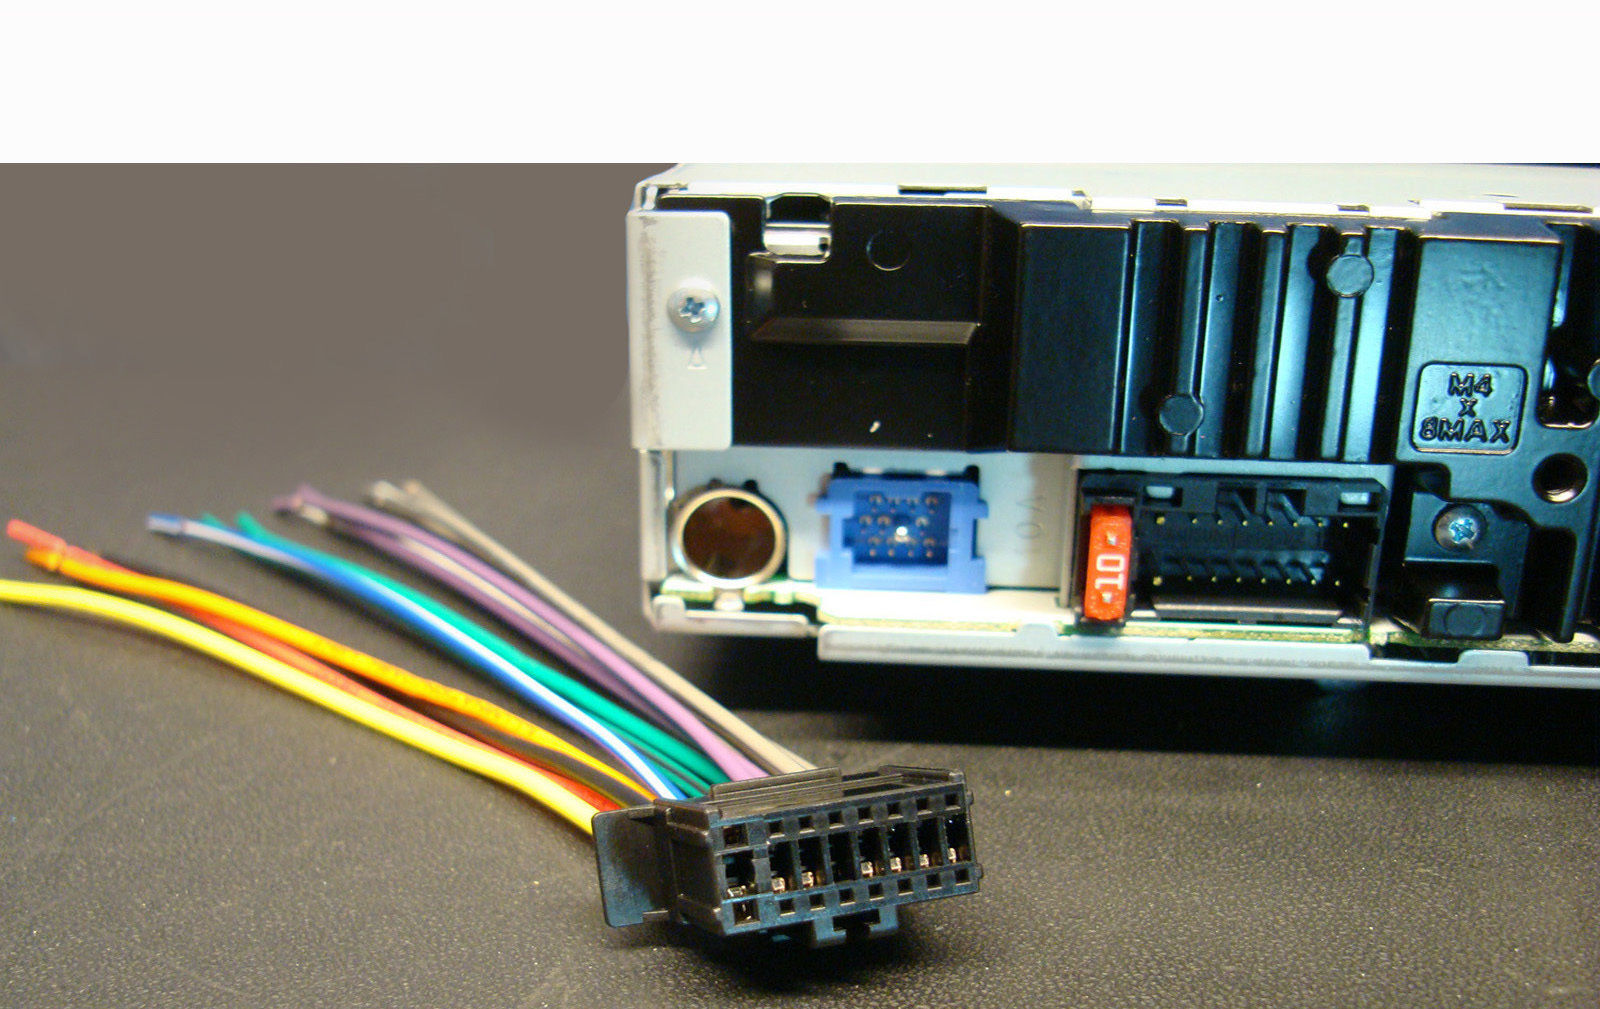 US $0.5 |PIONEER RADIO PLUG STEREO WIRE HARNESS DEH 2200UB 1300MP P4300UB Pioneer Deh Wiring Harness on pioneer head unit wiring harness, pioneer deh-x6500bt wiring-diagram, pioneer deh 6400bt installation, pioneer deh-1300mp, pioneer cd player wiring harness, pioneer wiring harness colors,